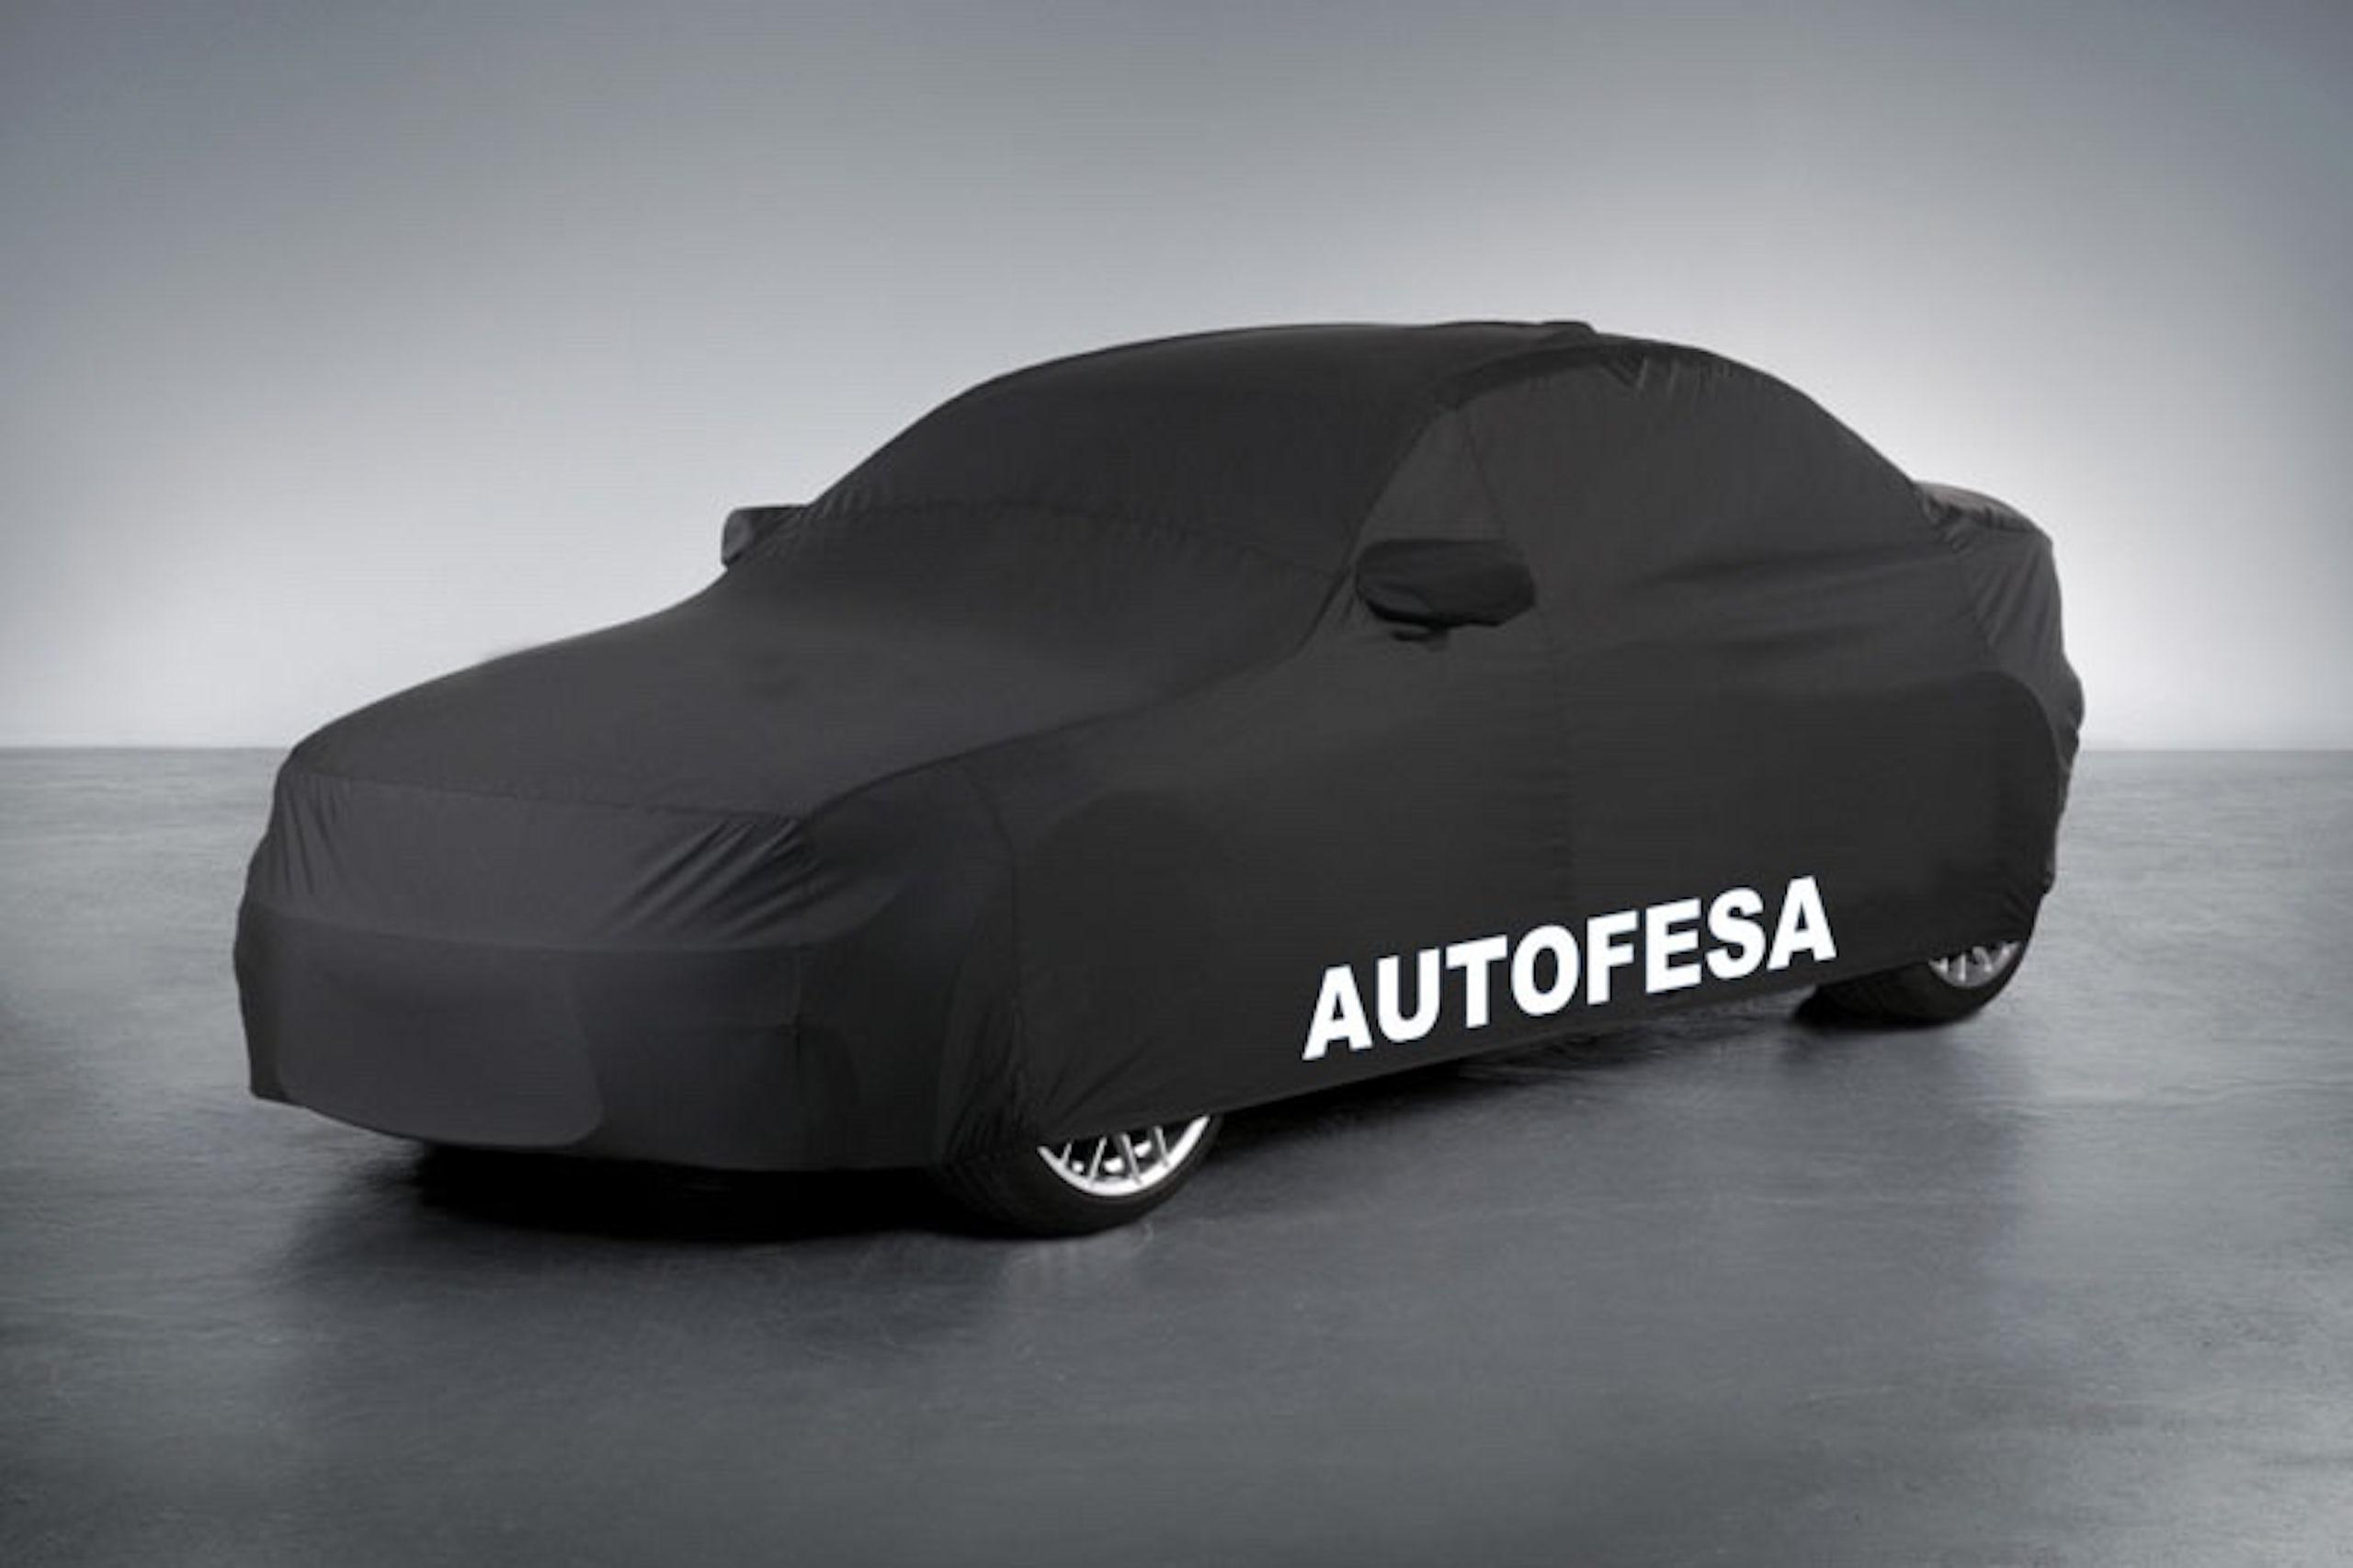 Volvo Xc 60 2.0 T8 Twin Momentum Hybrido Enchufable AWD Auto 407cv 5p S/S - Foto 18